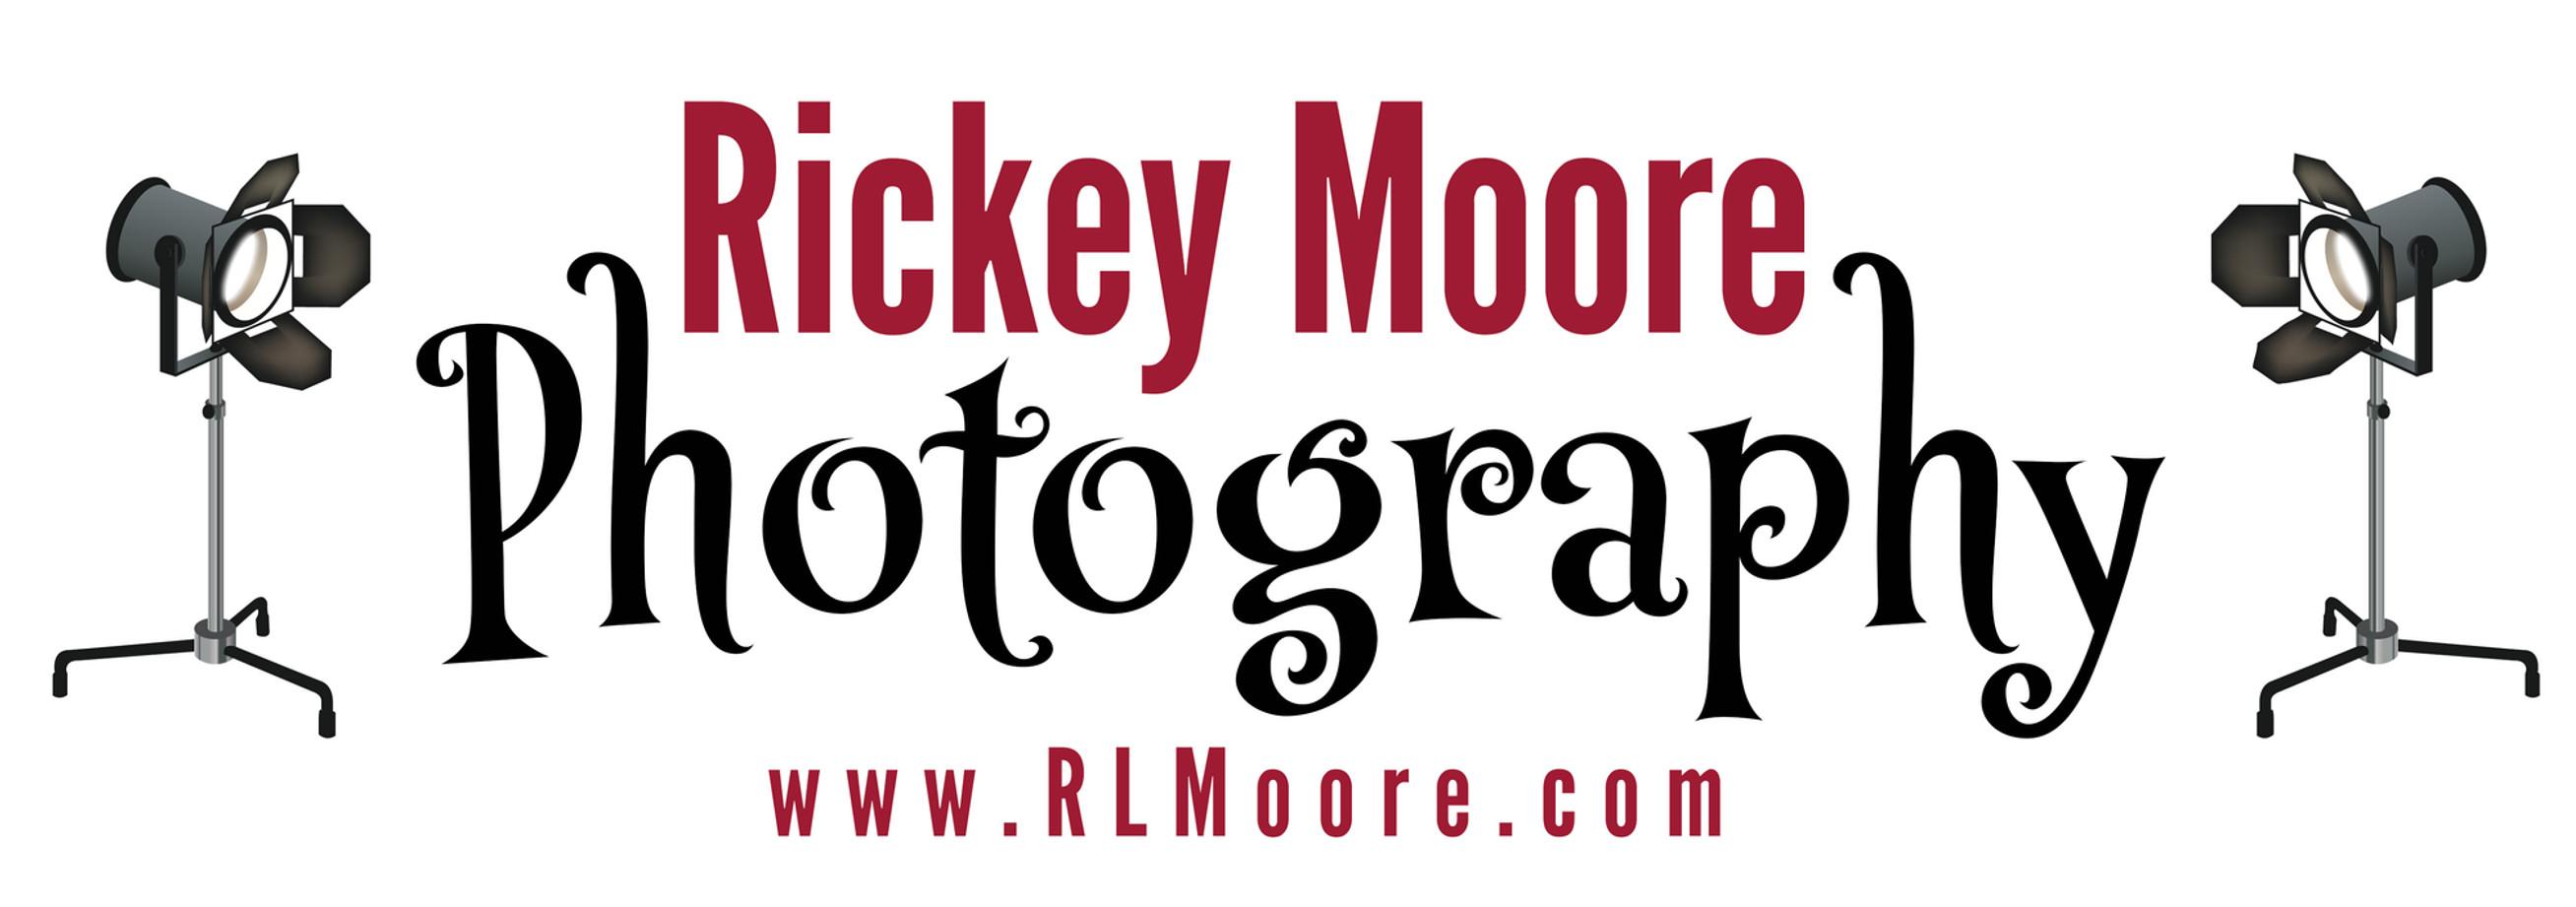 RLMoore Logo.jpg